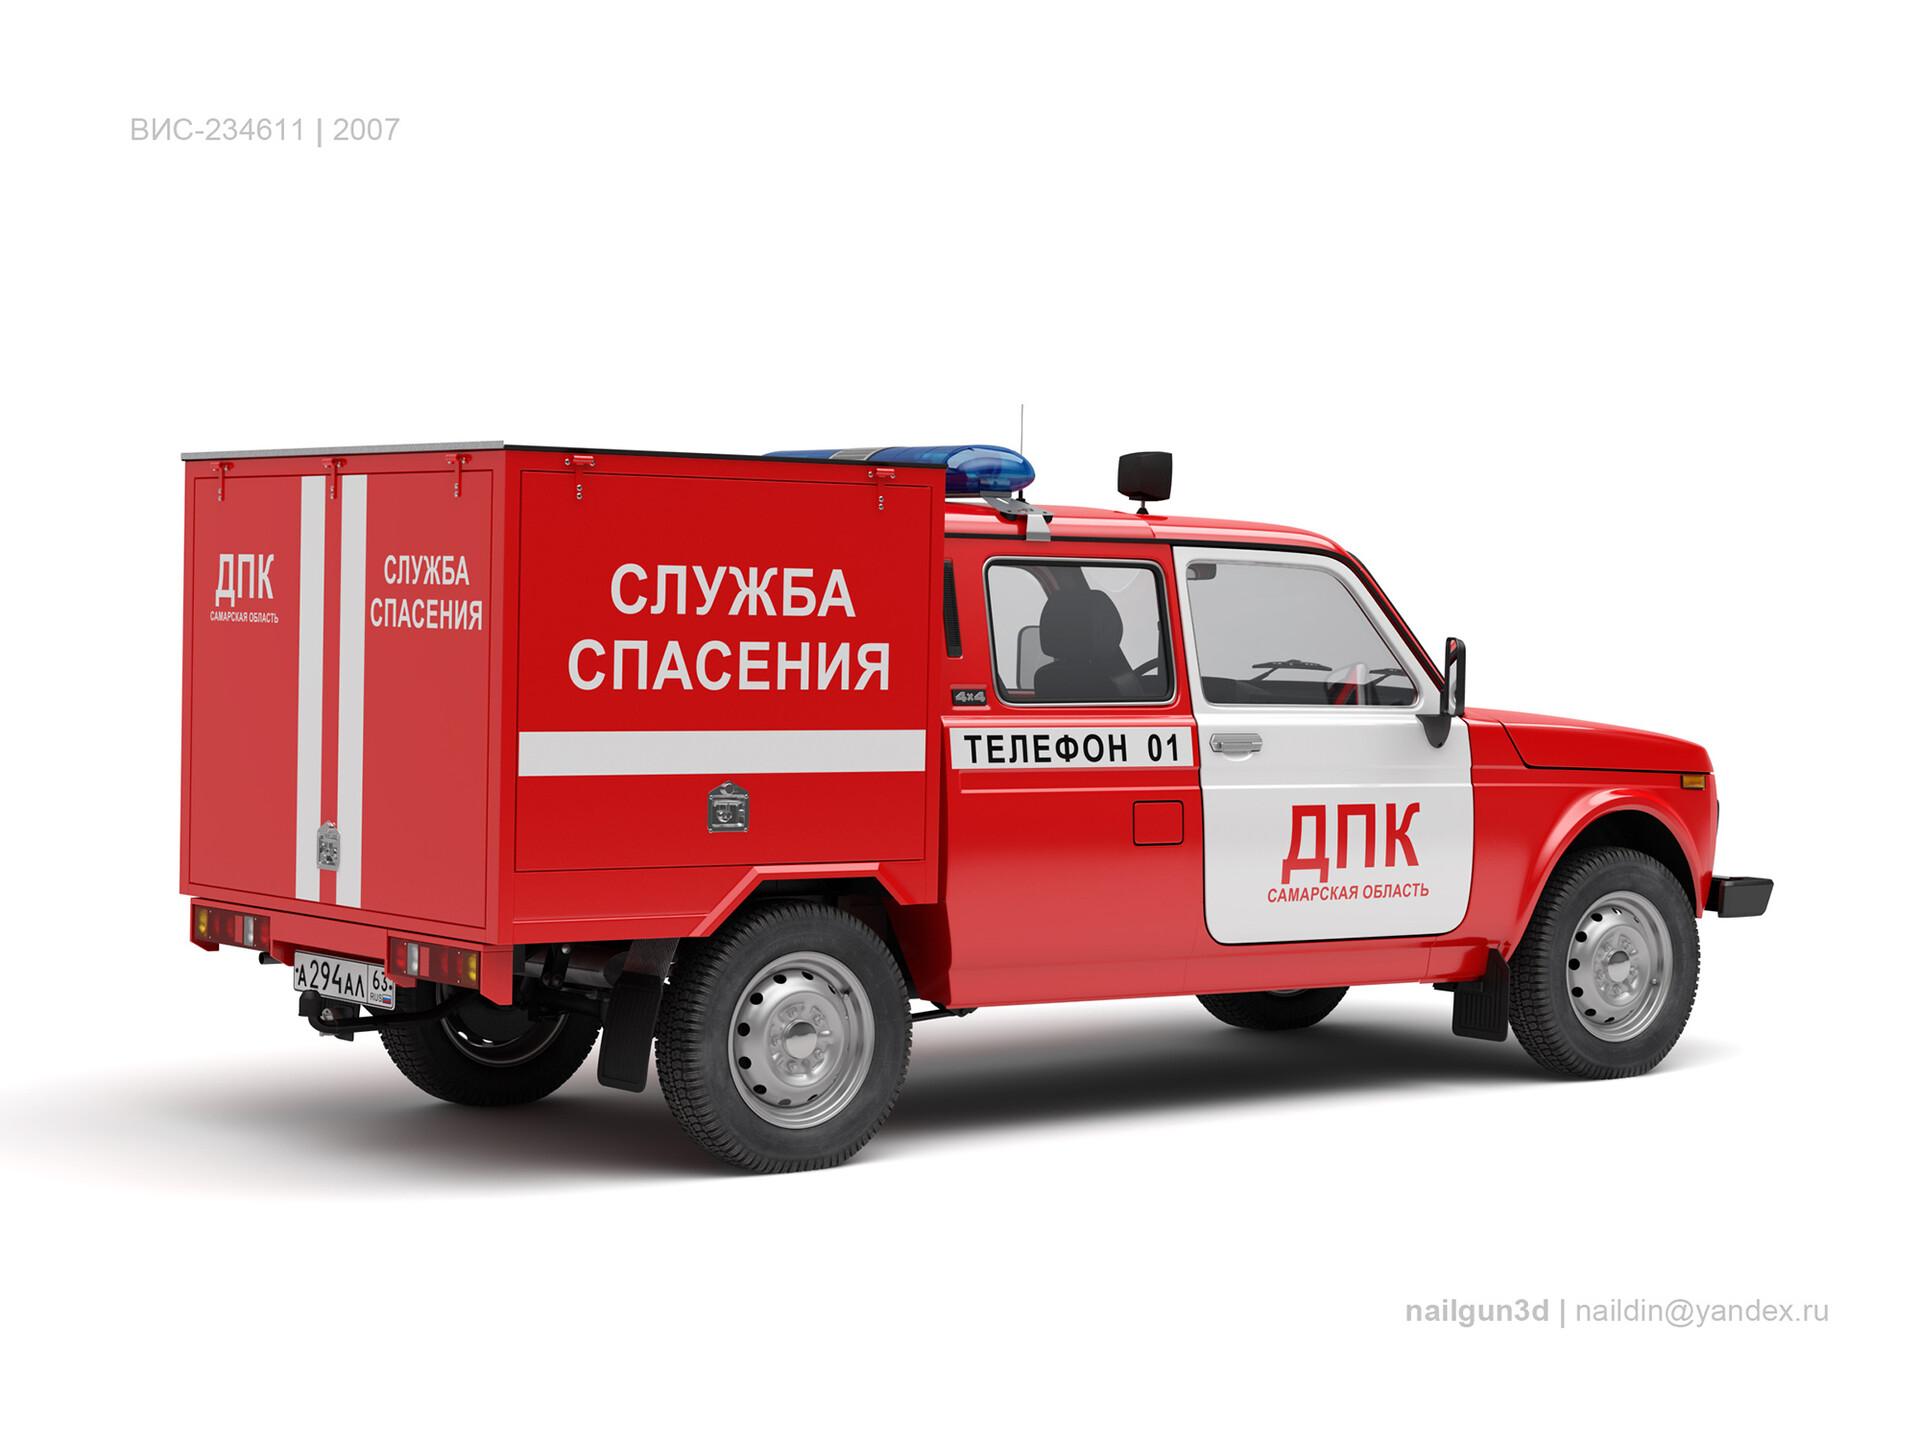 Nail khusnutdinov ussr vaz russia vaz 21213 vis 234611 2007 1